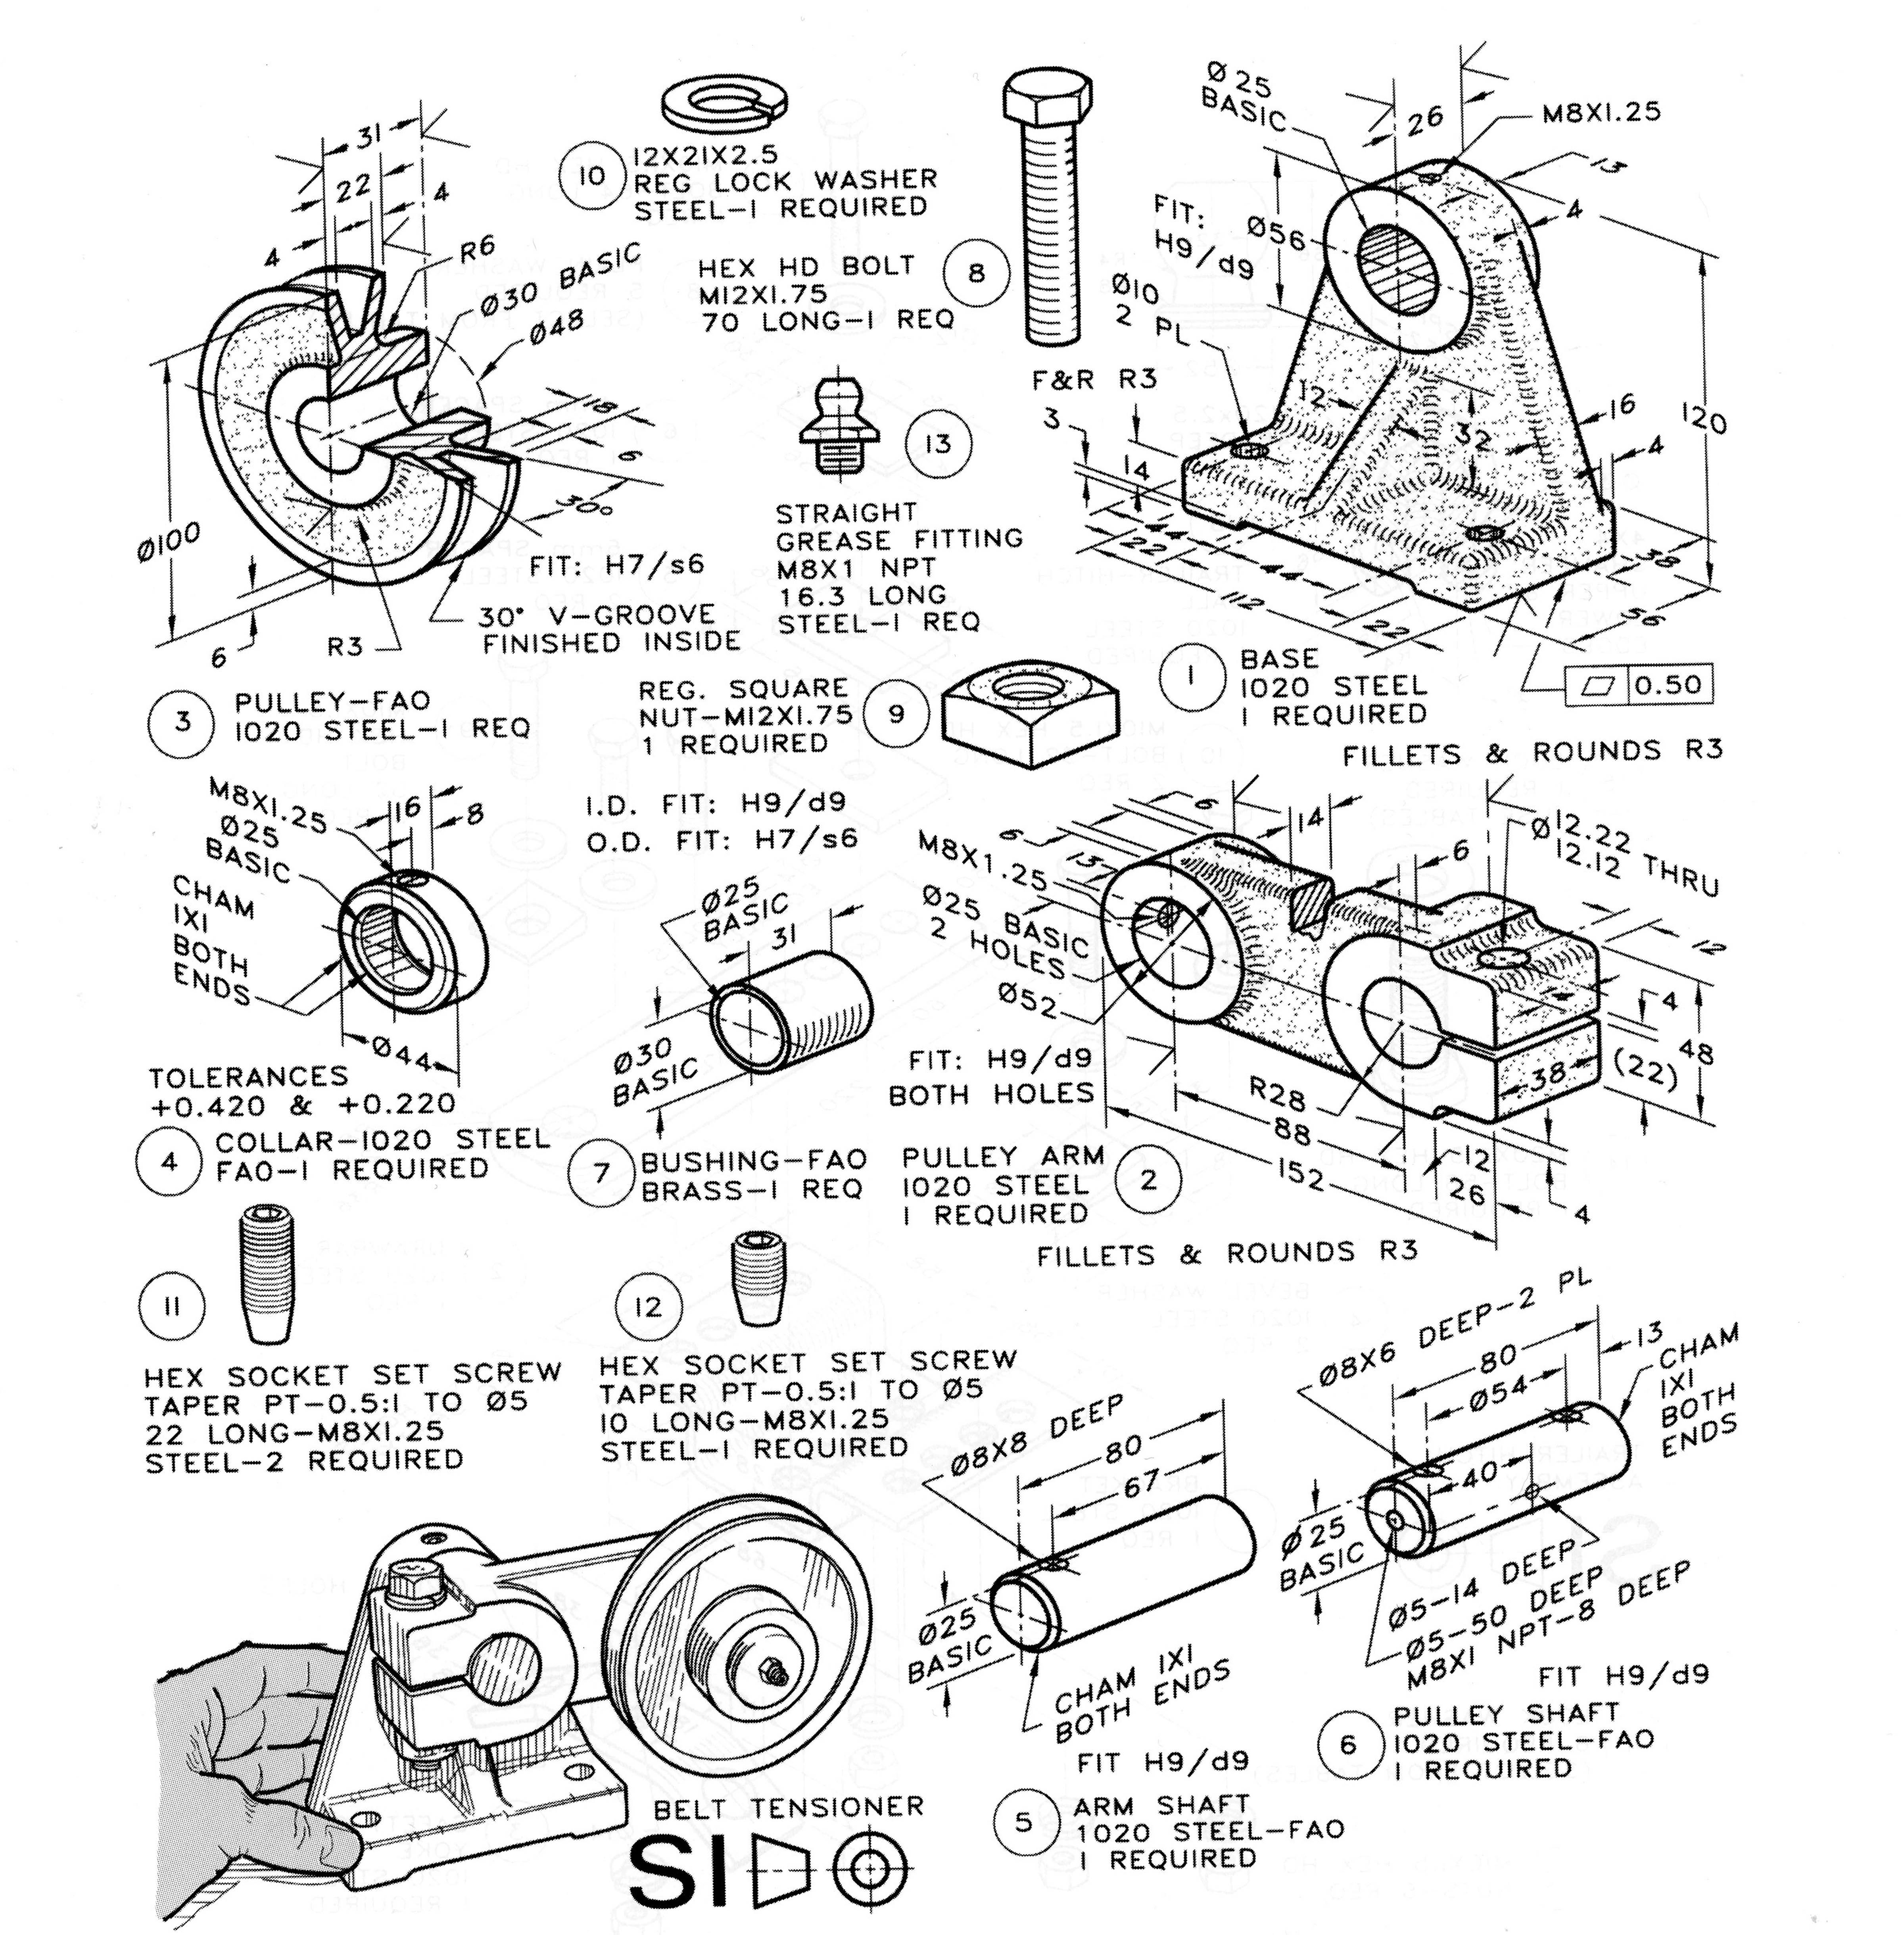 Cad Geometric Modeling: Pin By Robert Watson On Davinci's Bookshelf